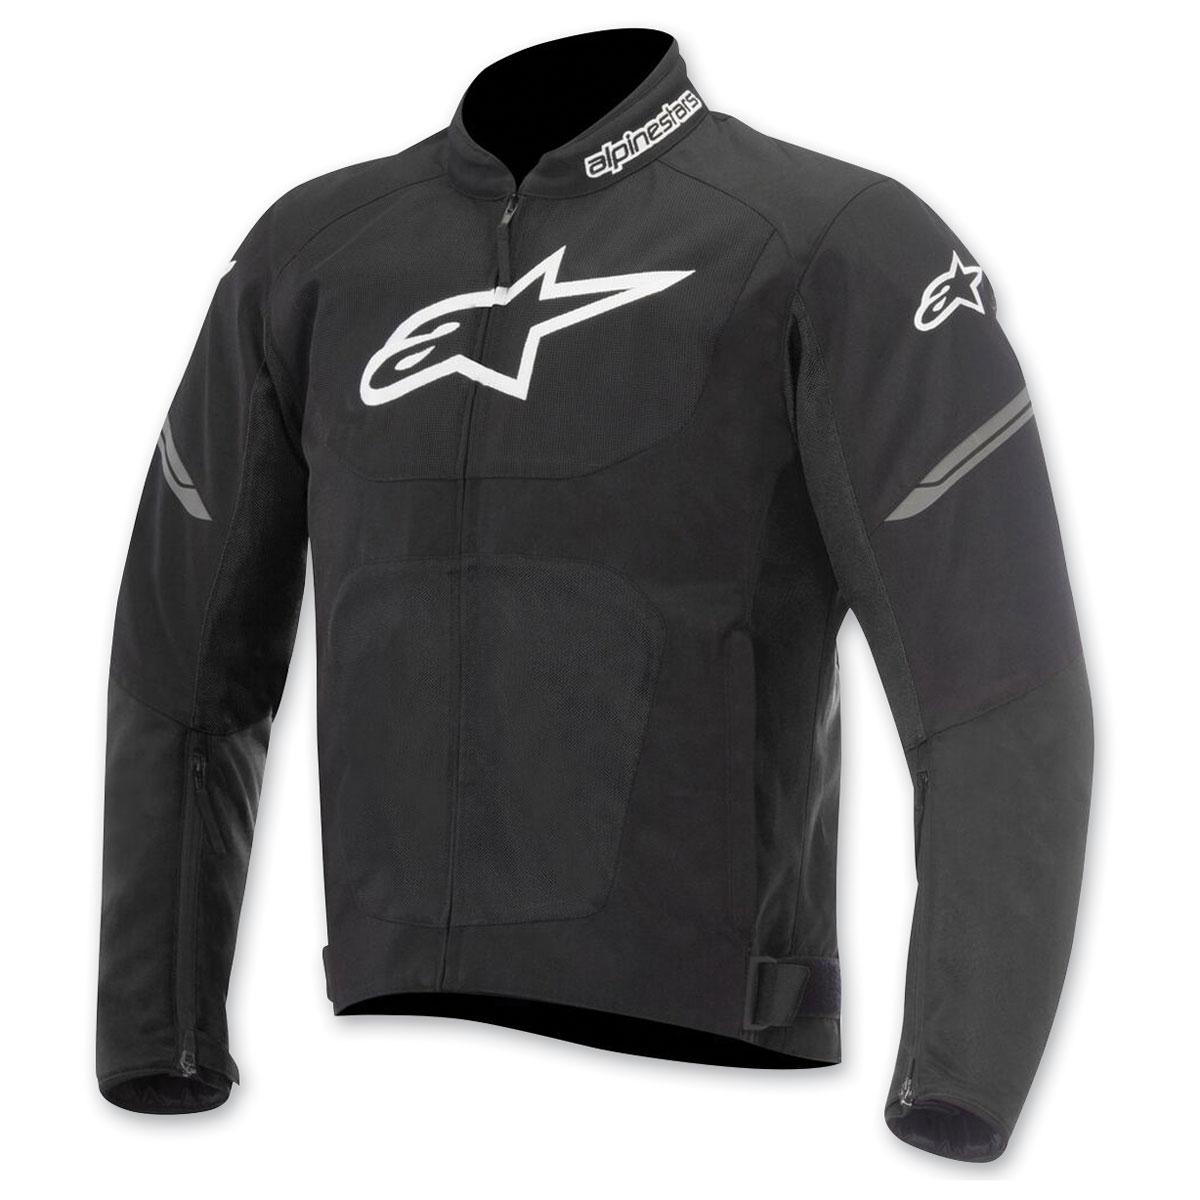 Alpinestars Men's Viper Air Black Textile Jacket